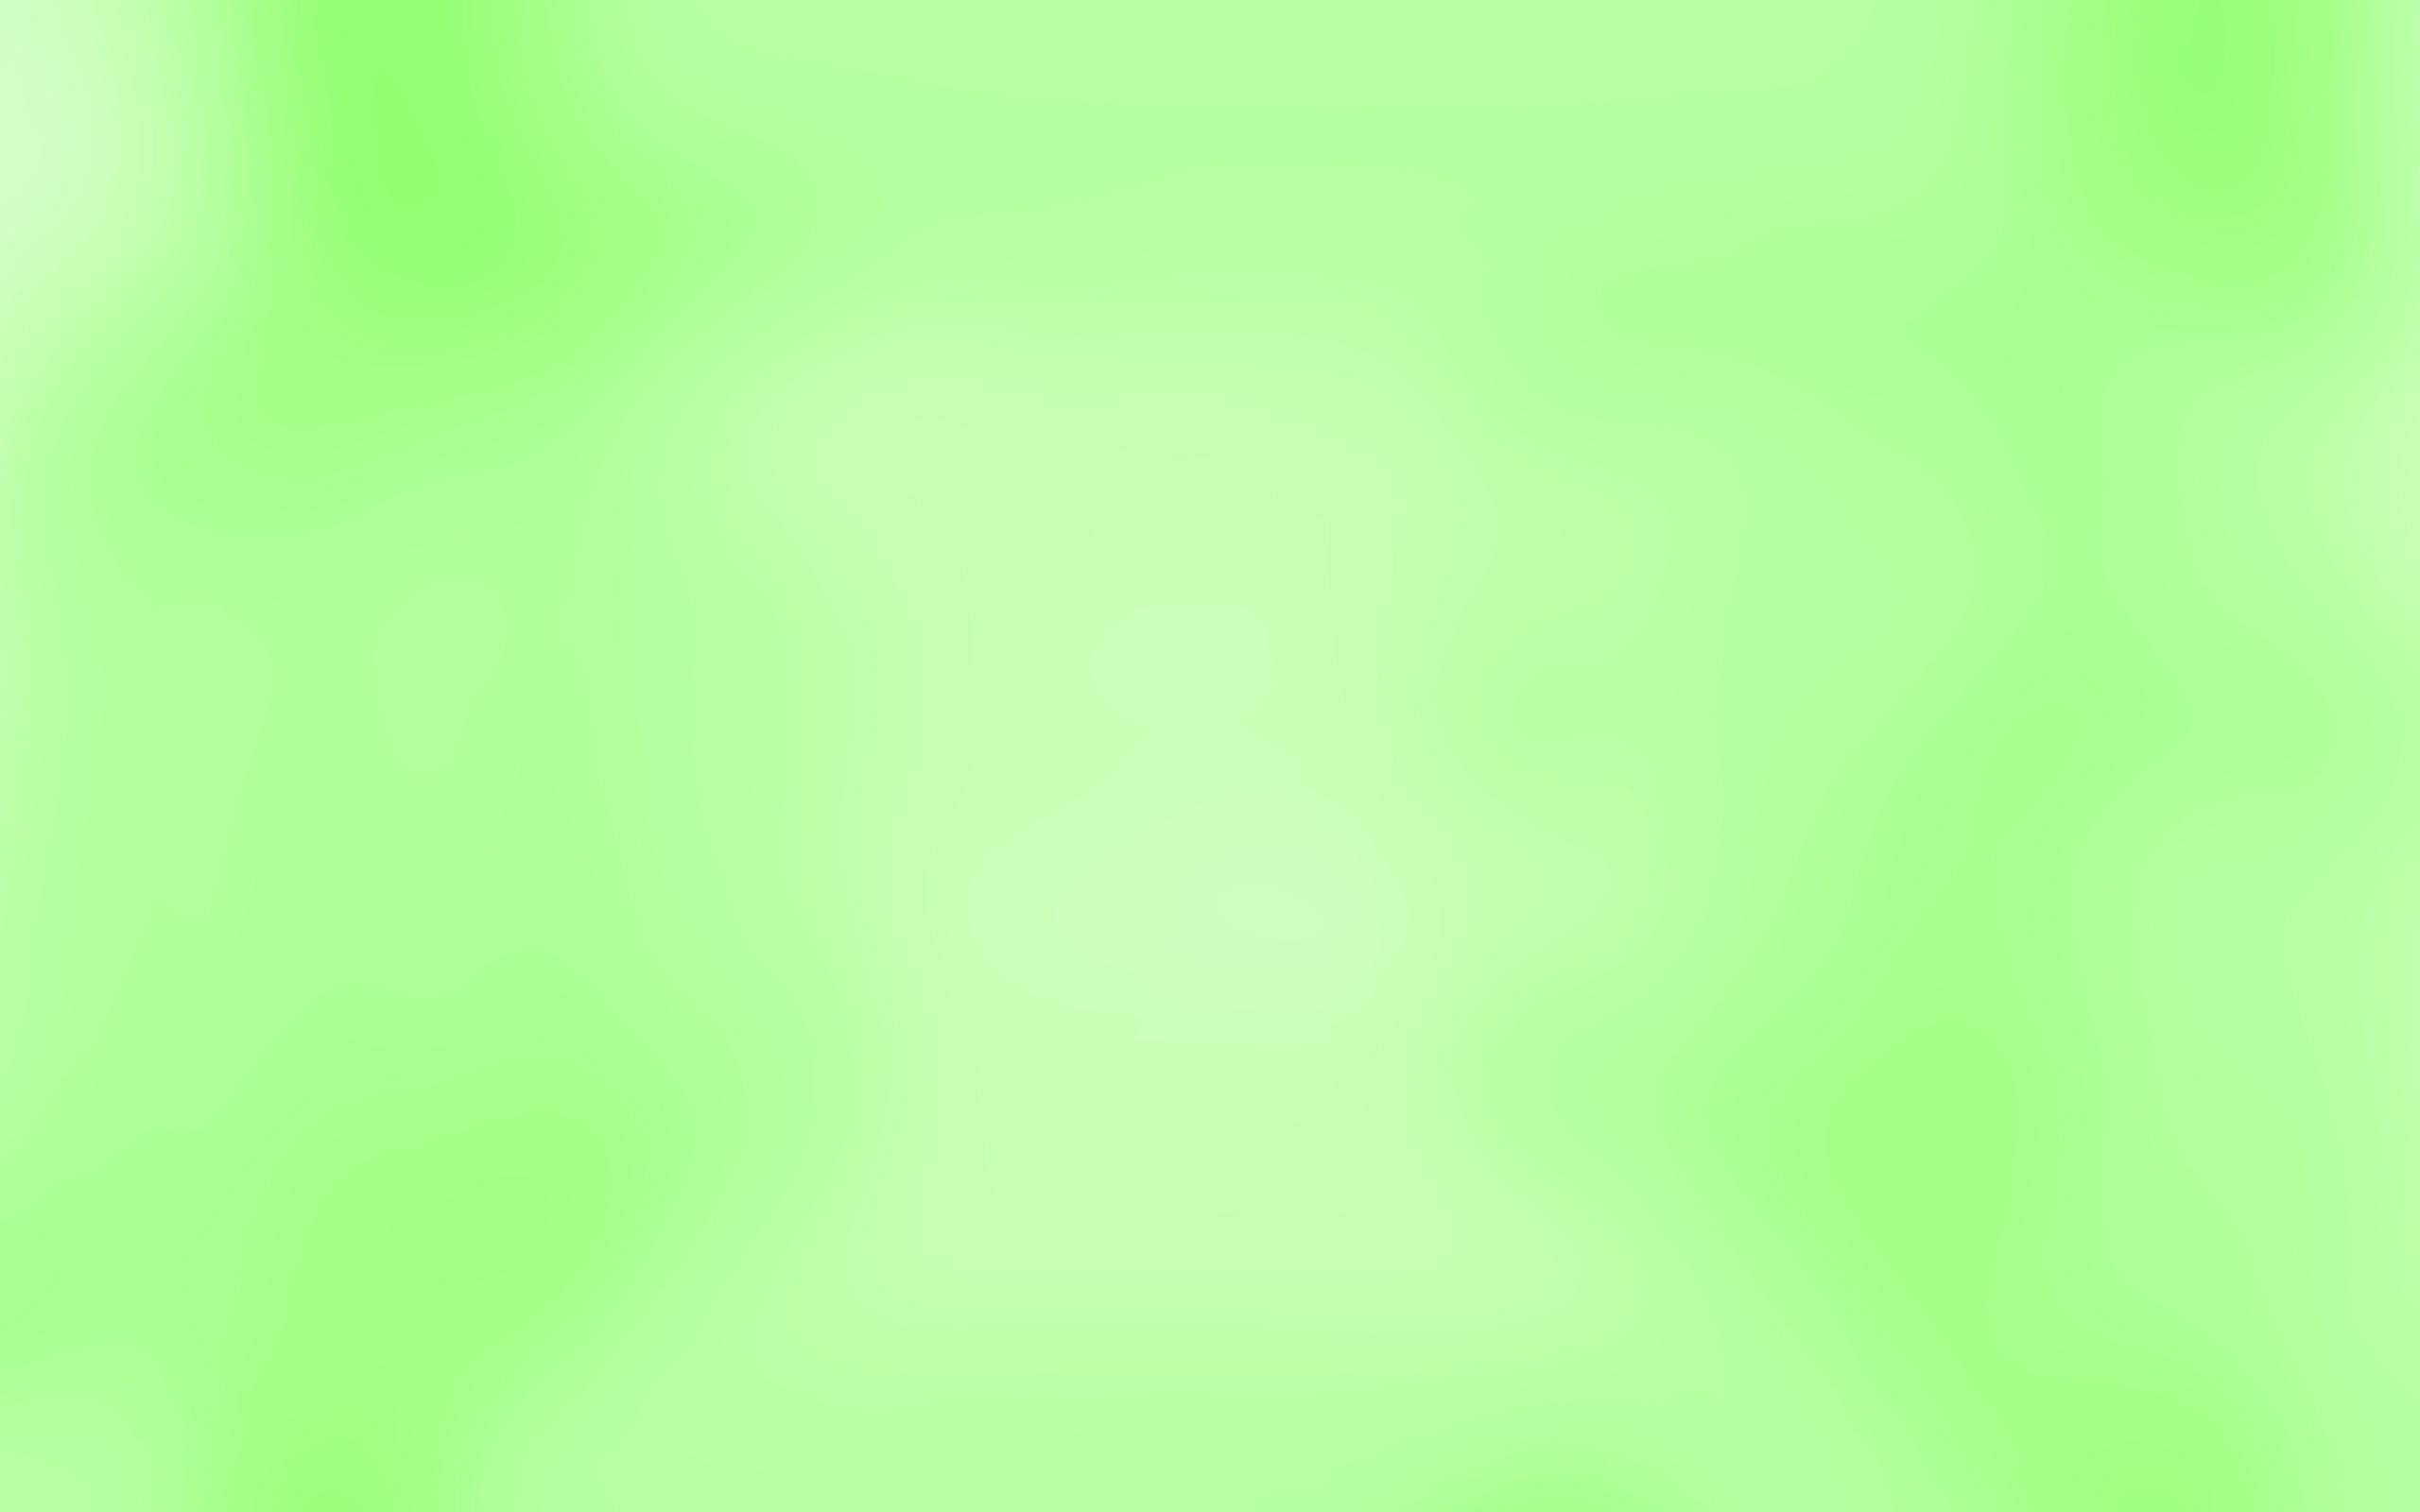 Light Green Backgrounds – Wallpaper Cave